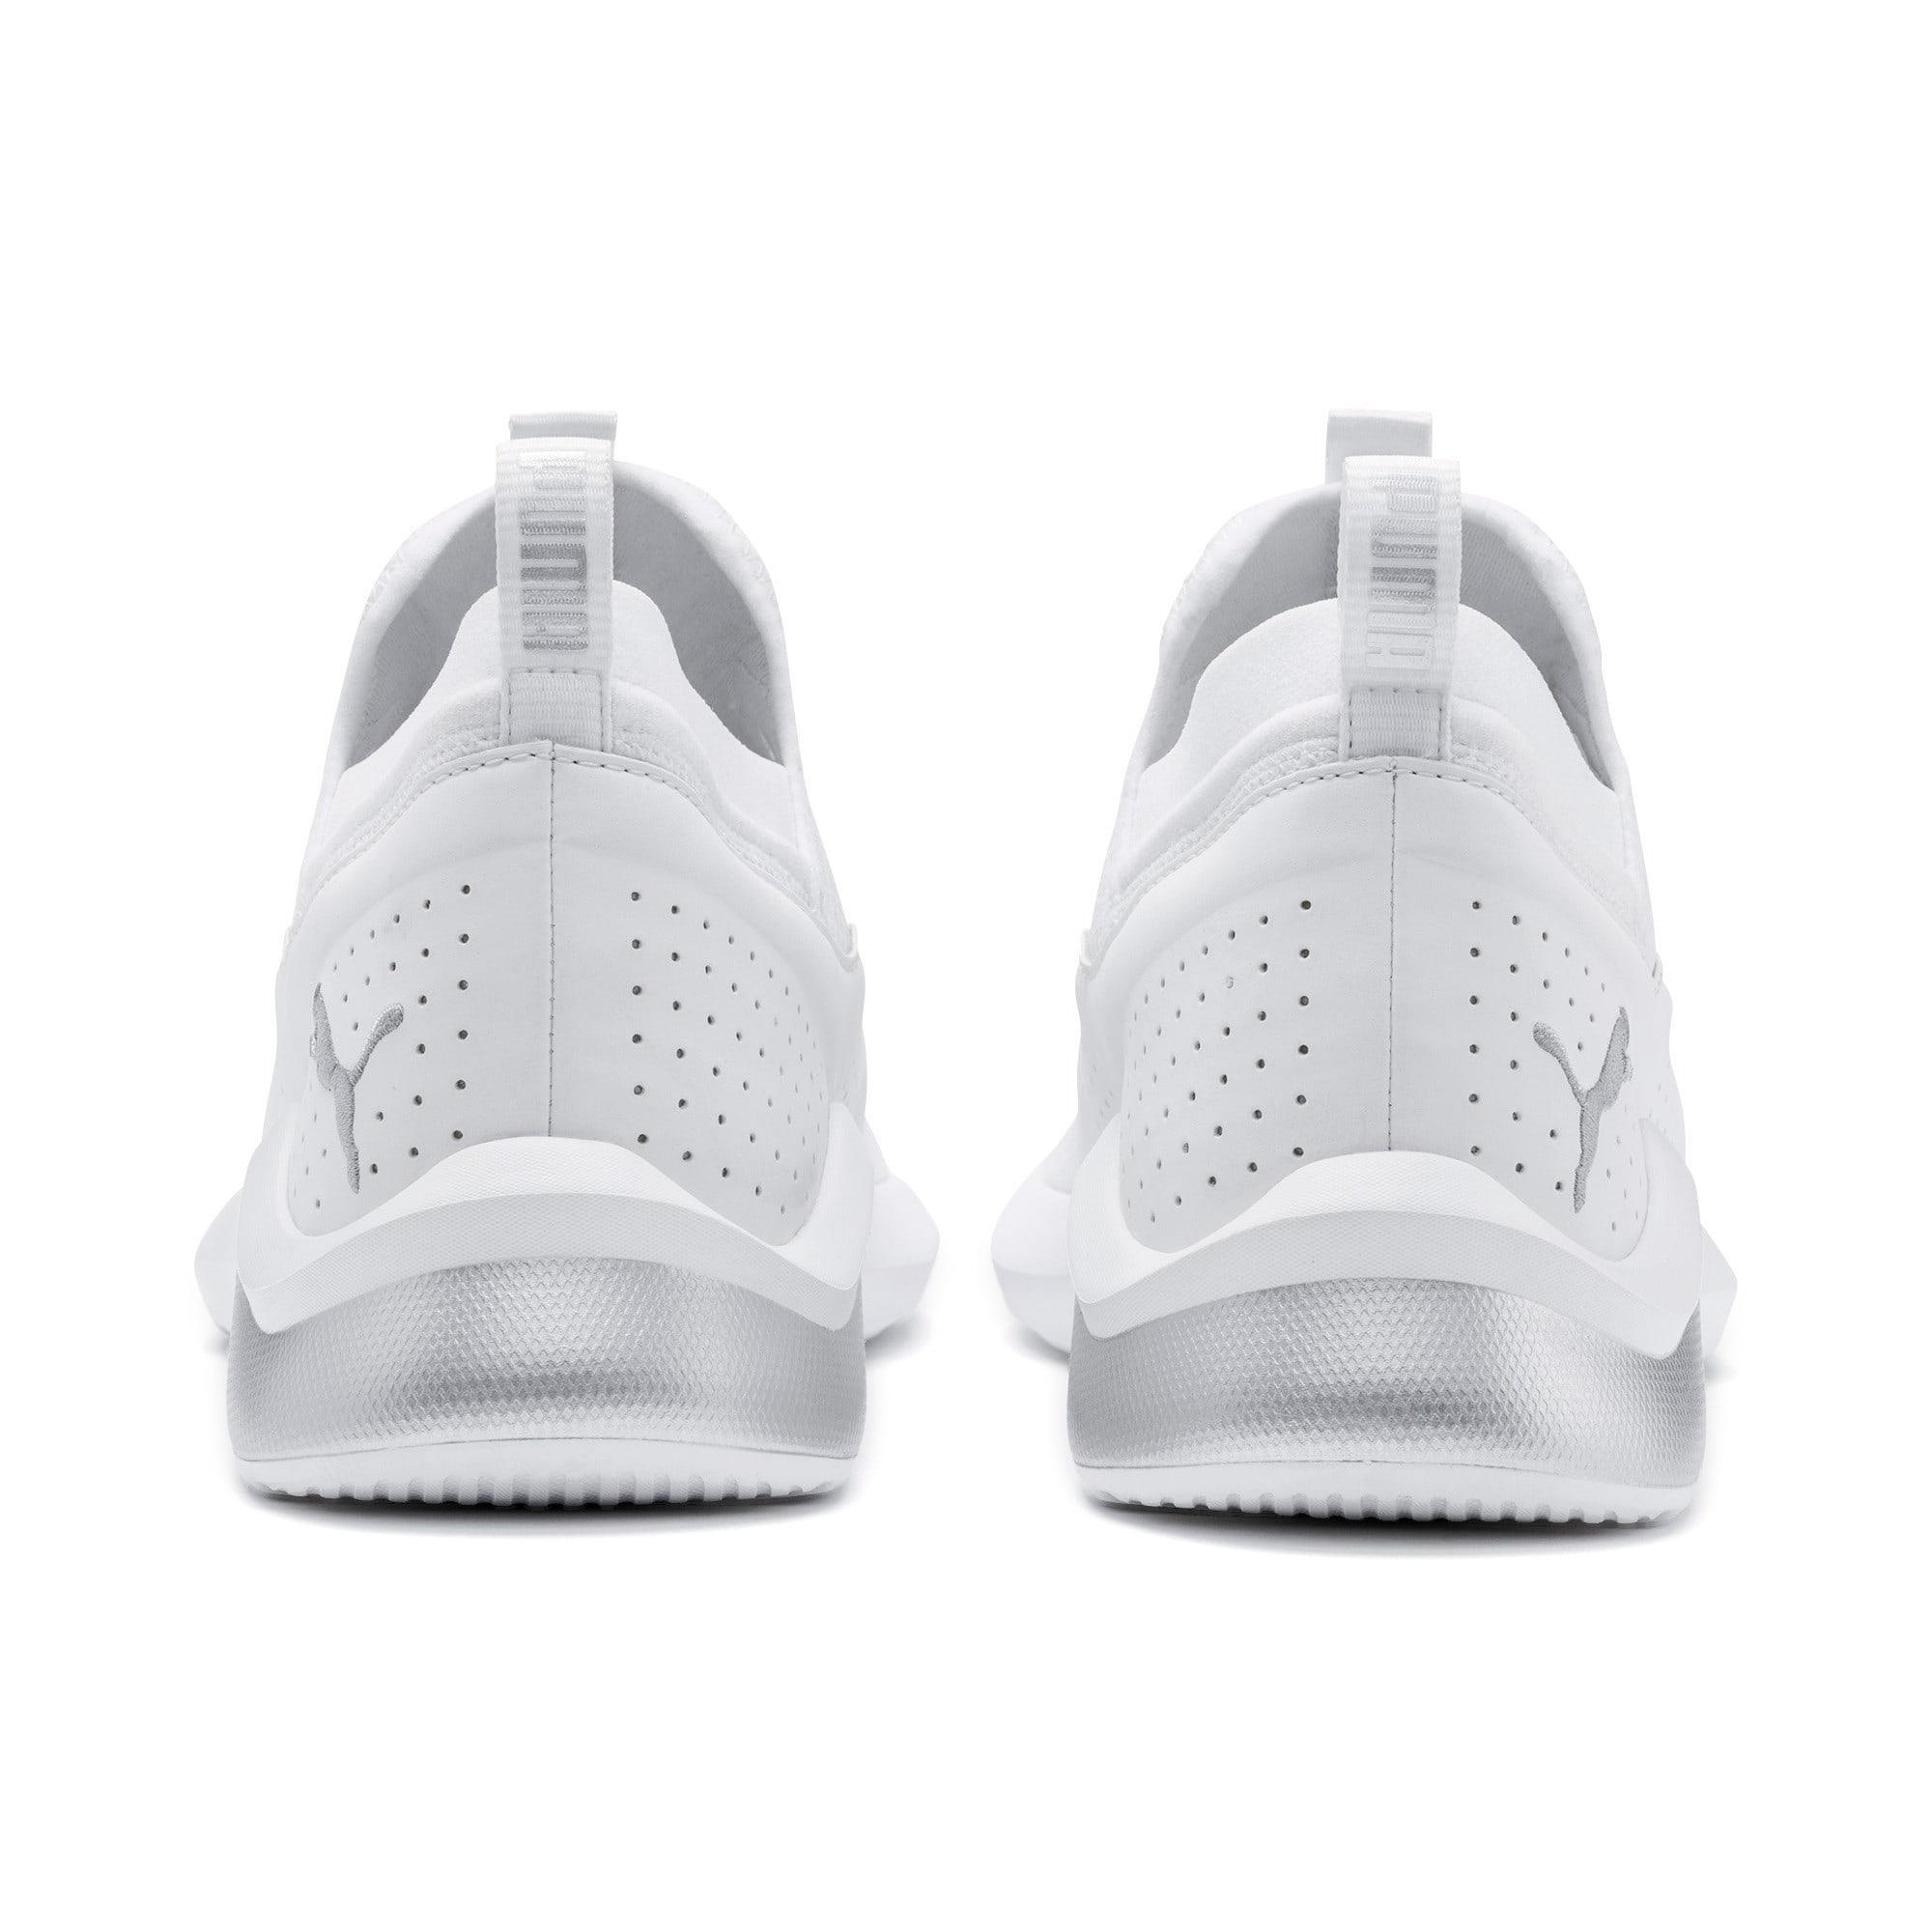 Thumbnail 6 of Emergence Lights Men's Running Shoes, Puma White-Puma Silver, medium-IND